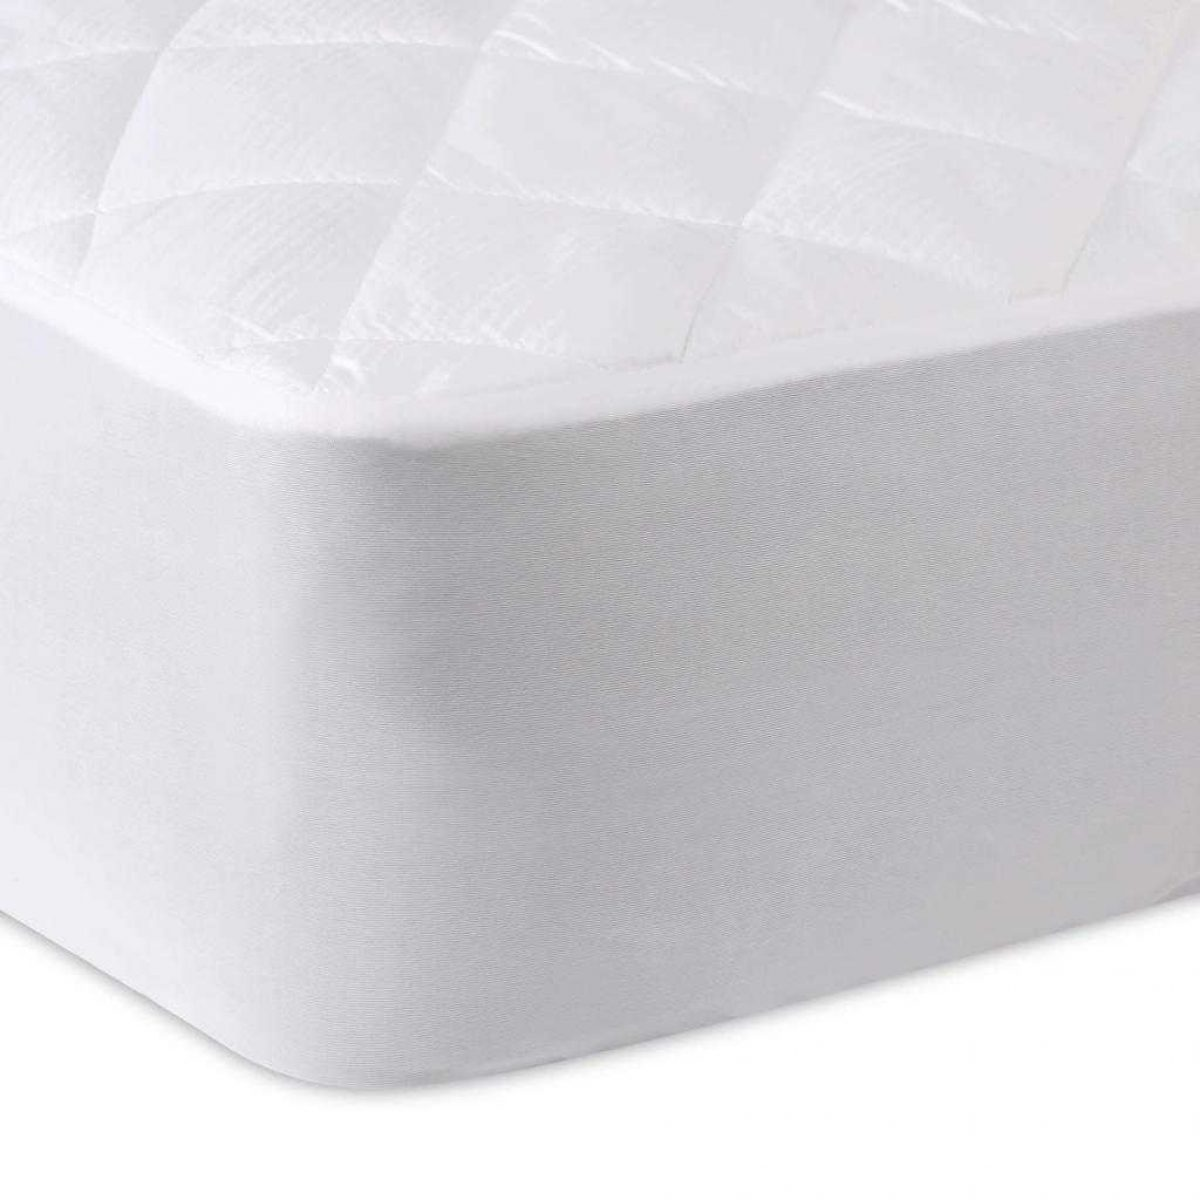 Fine Bedding Breathe Mattress Protector 1024x1024